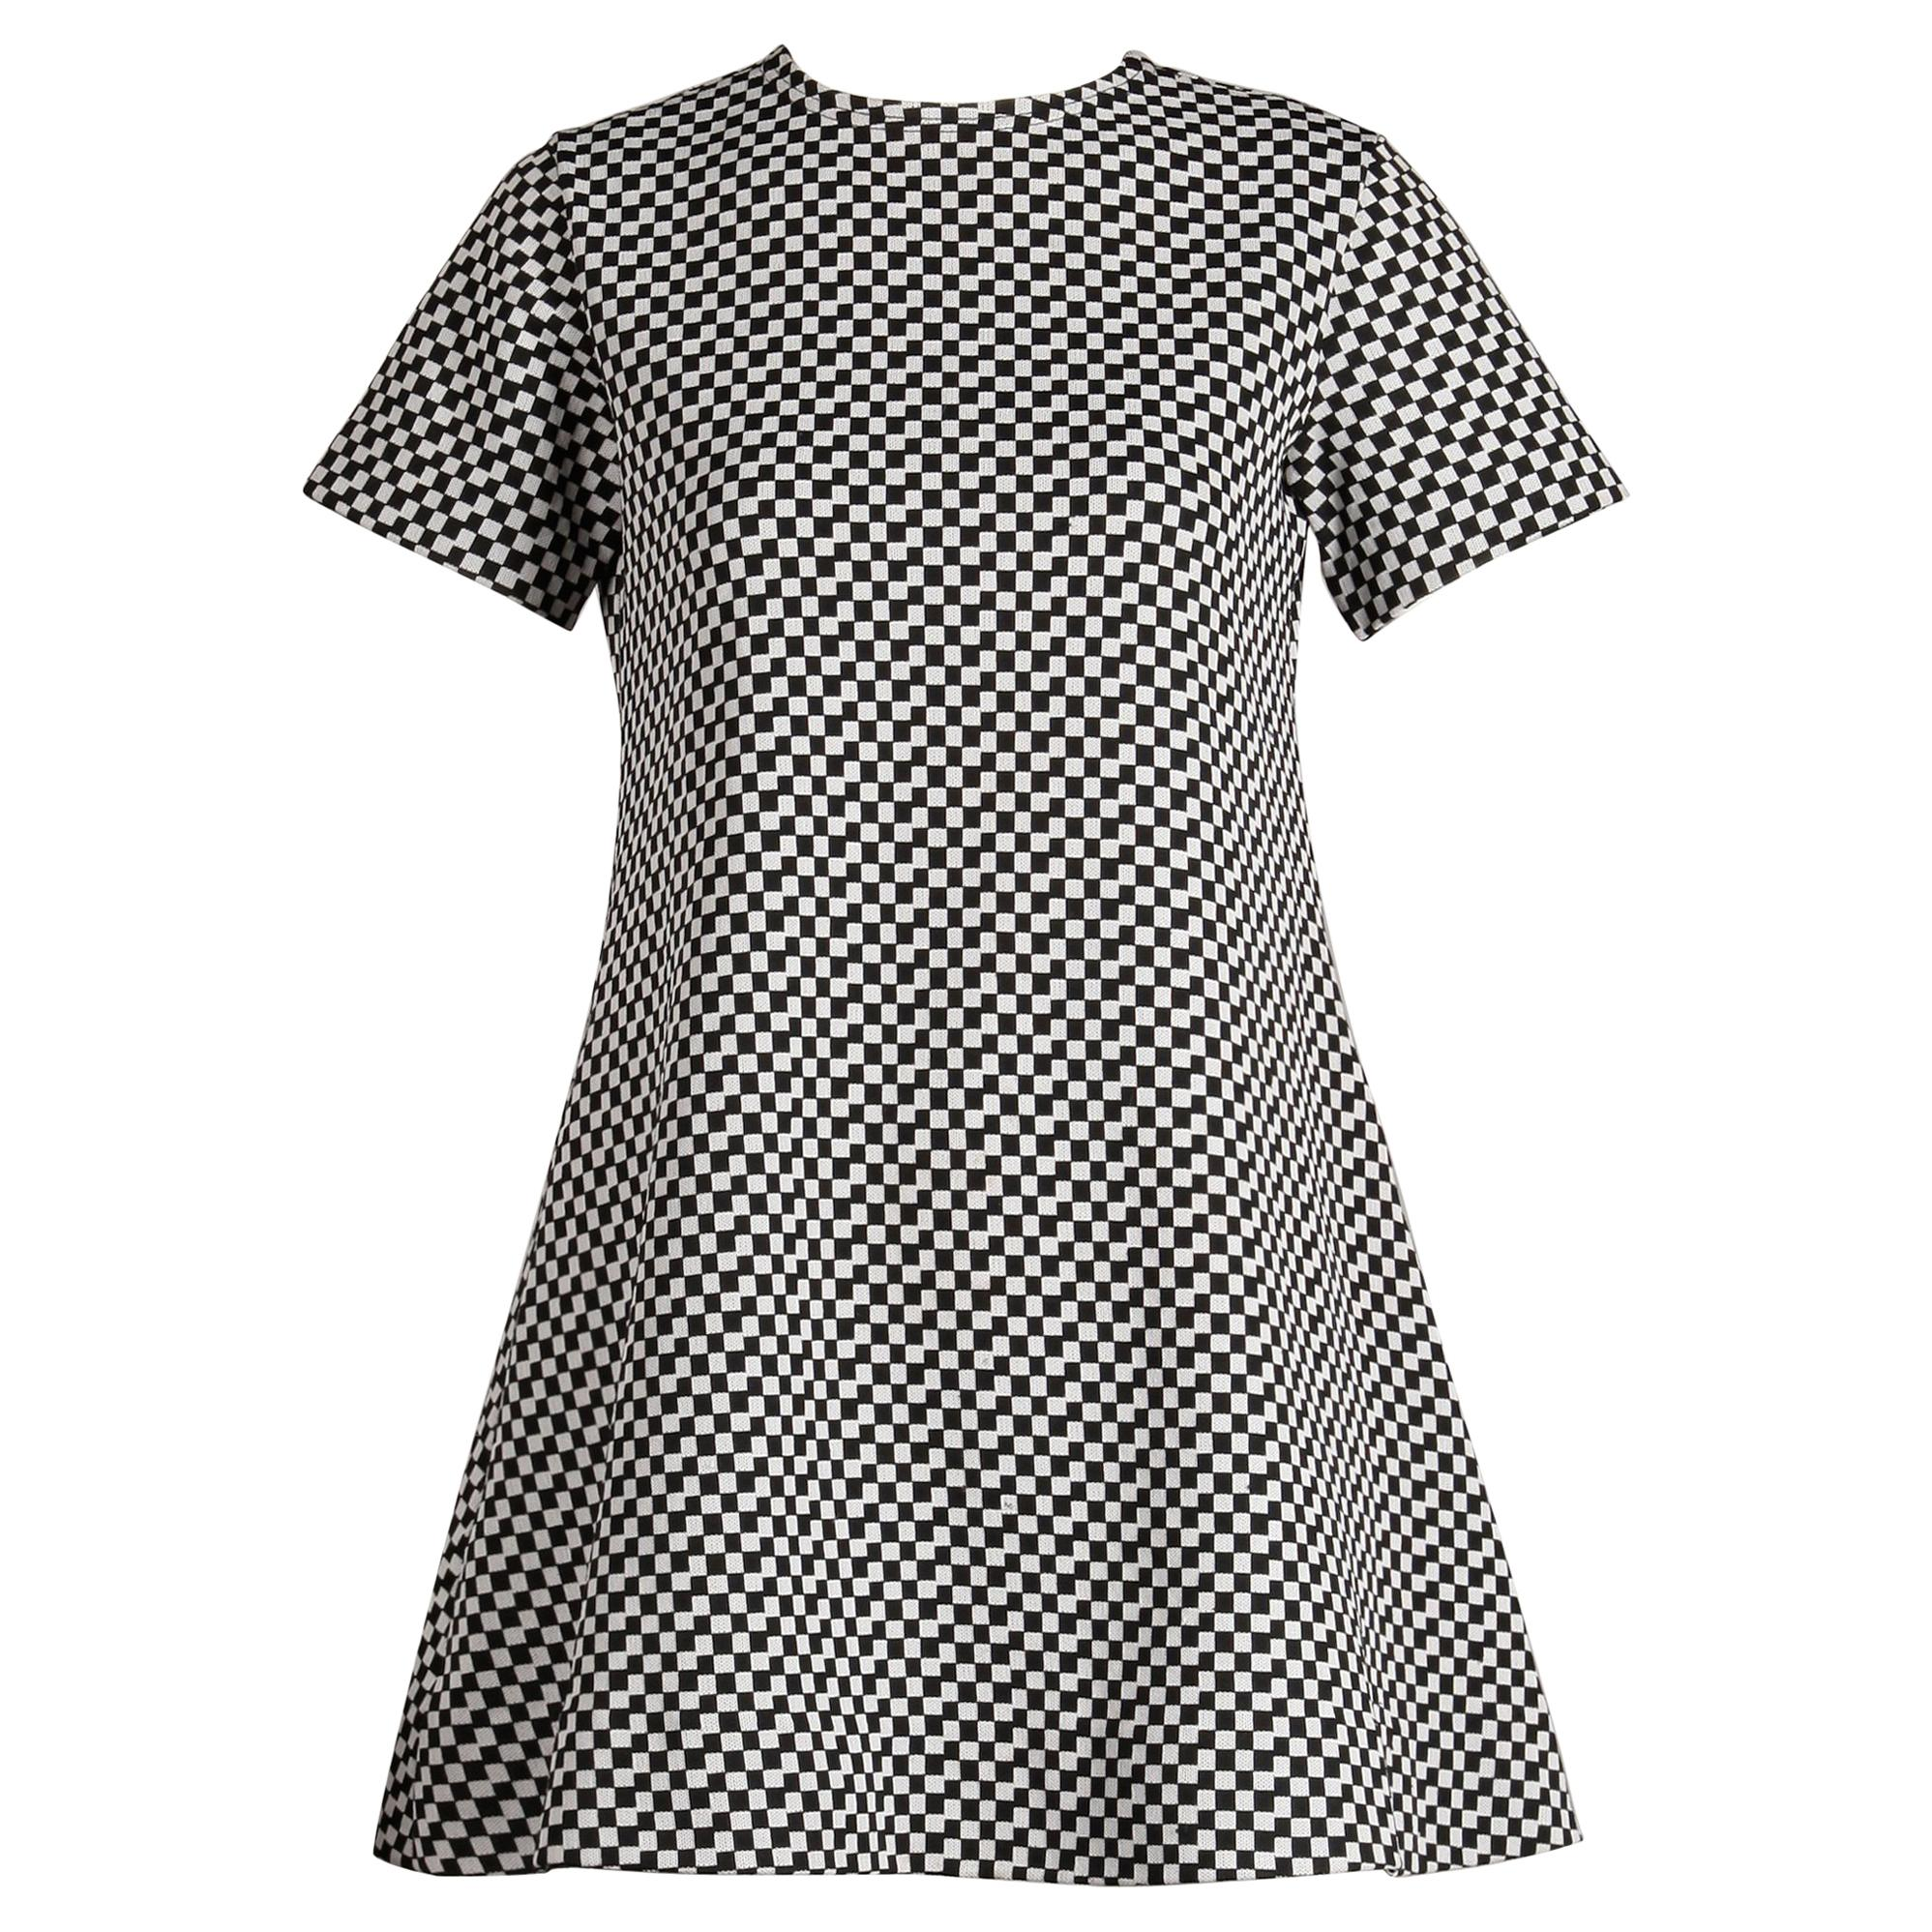 1960s Rudi Gernreich/ Harmon Knitwear Vintage Mod B&W Checker Mini Dress